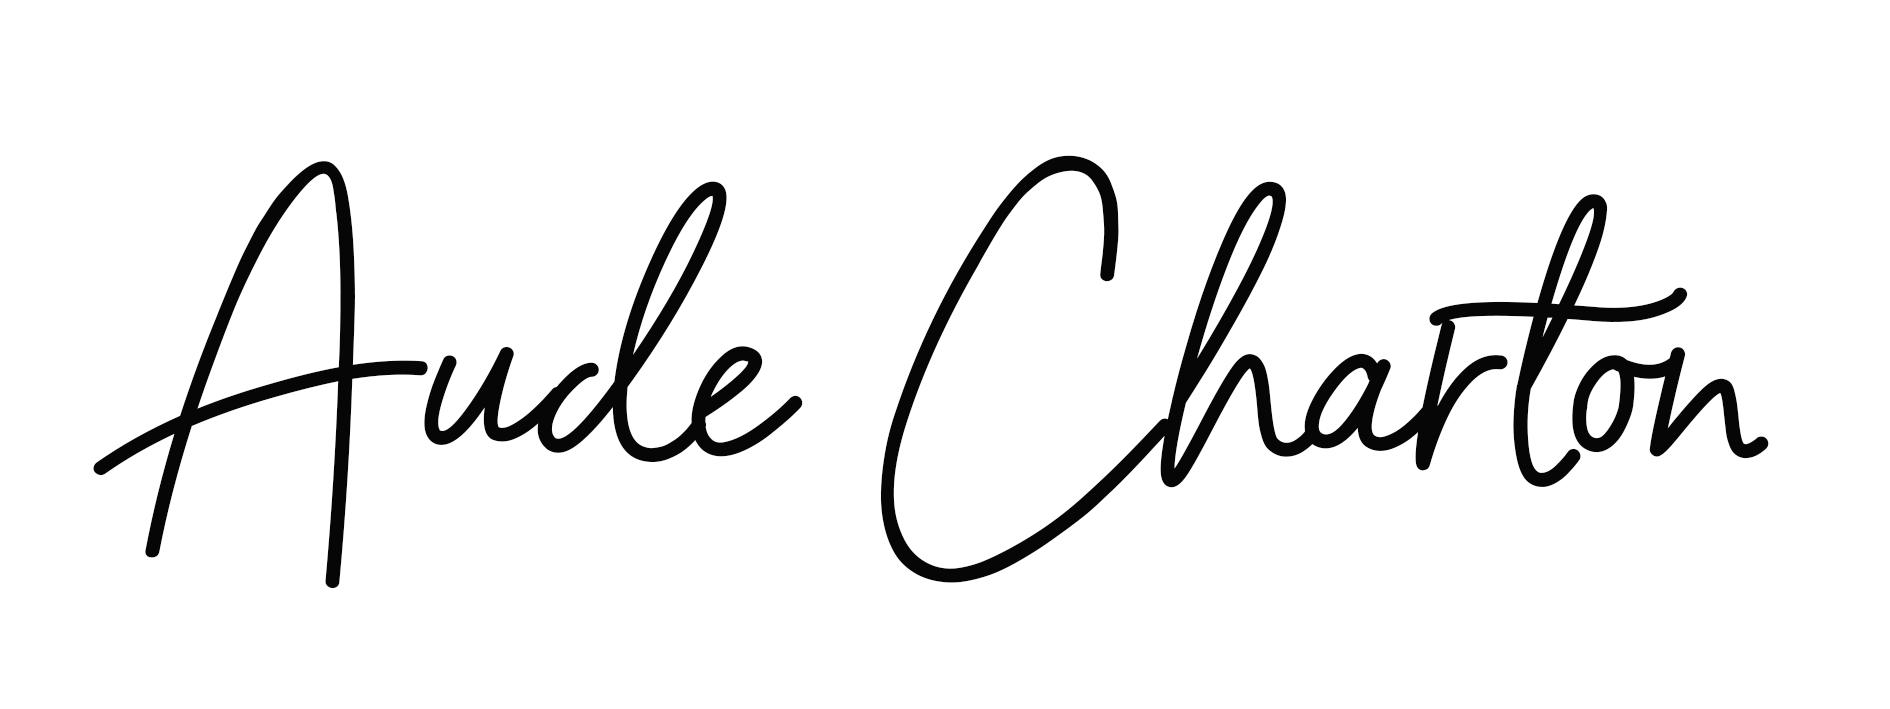 Aude Charton